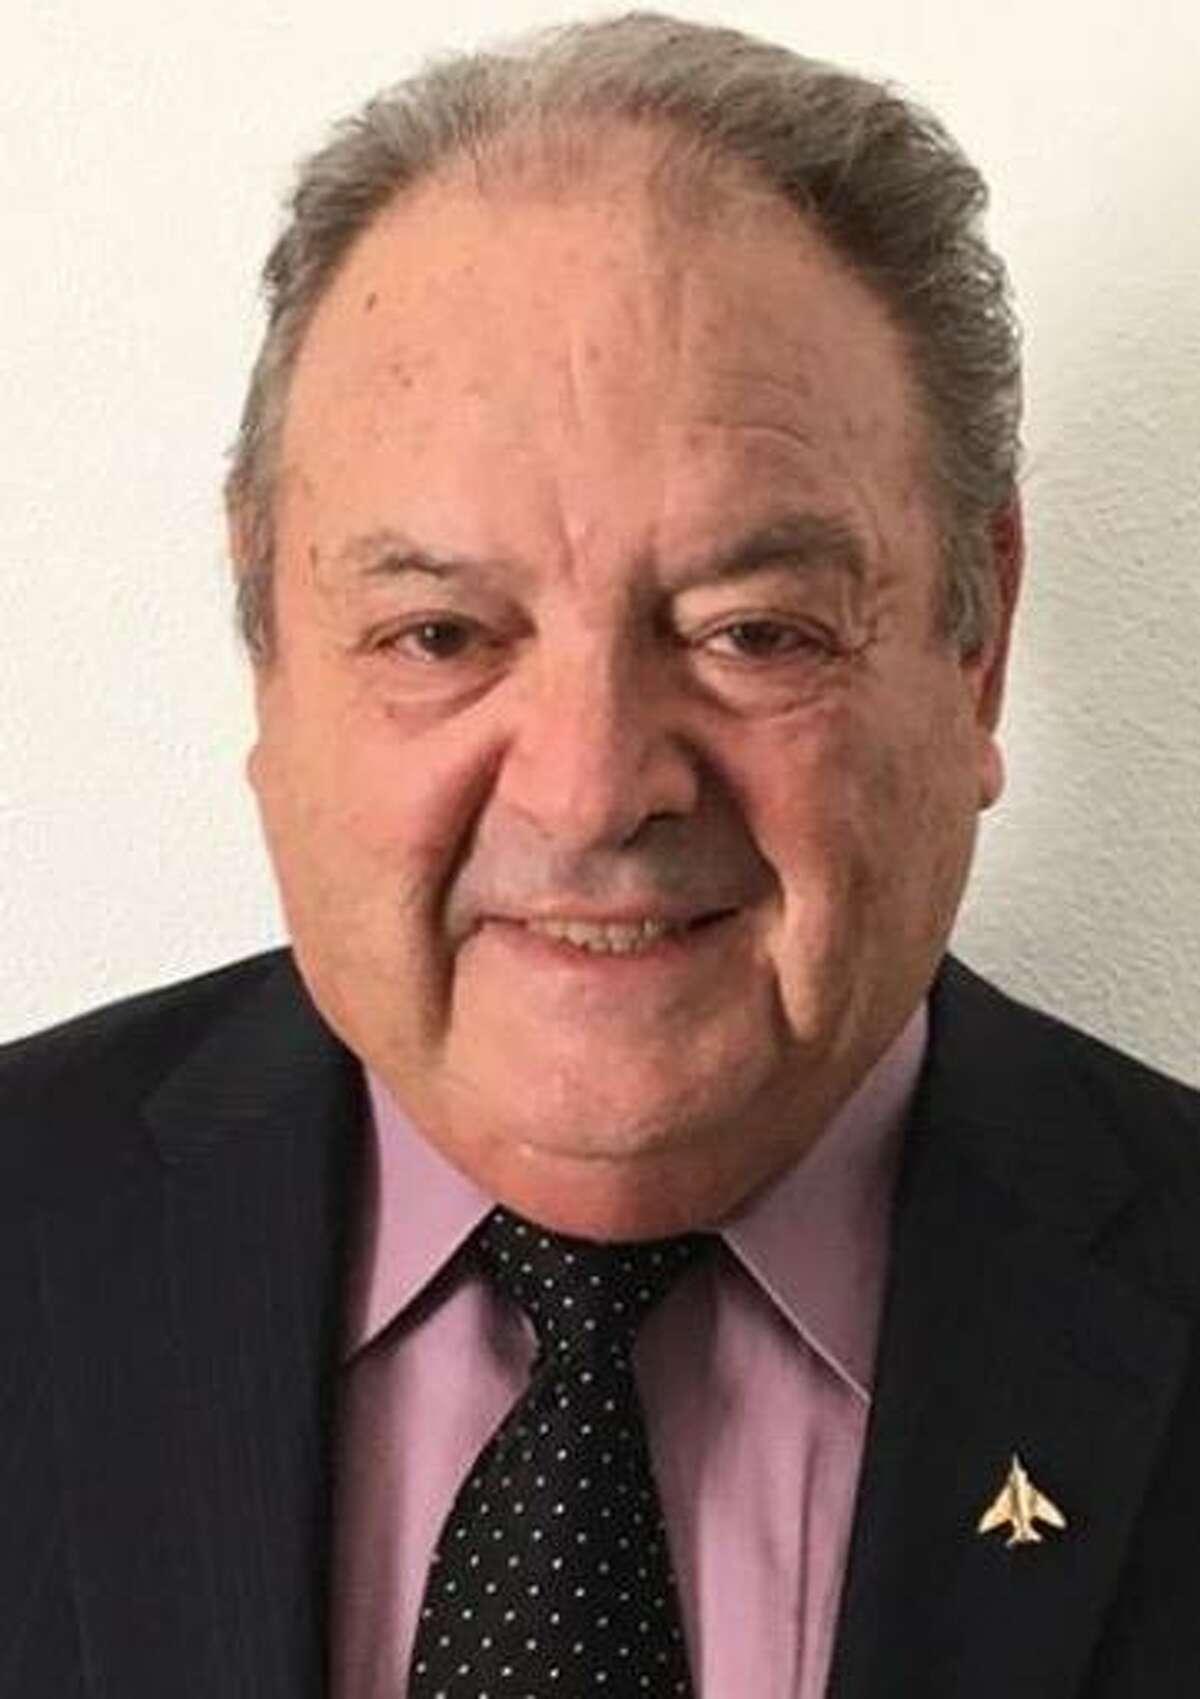 Charles Huff, preview for school board race, Schertz-Cibolo Universal City ISD